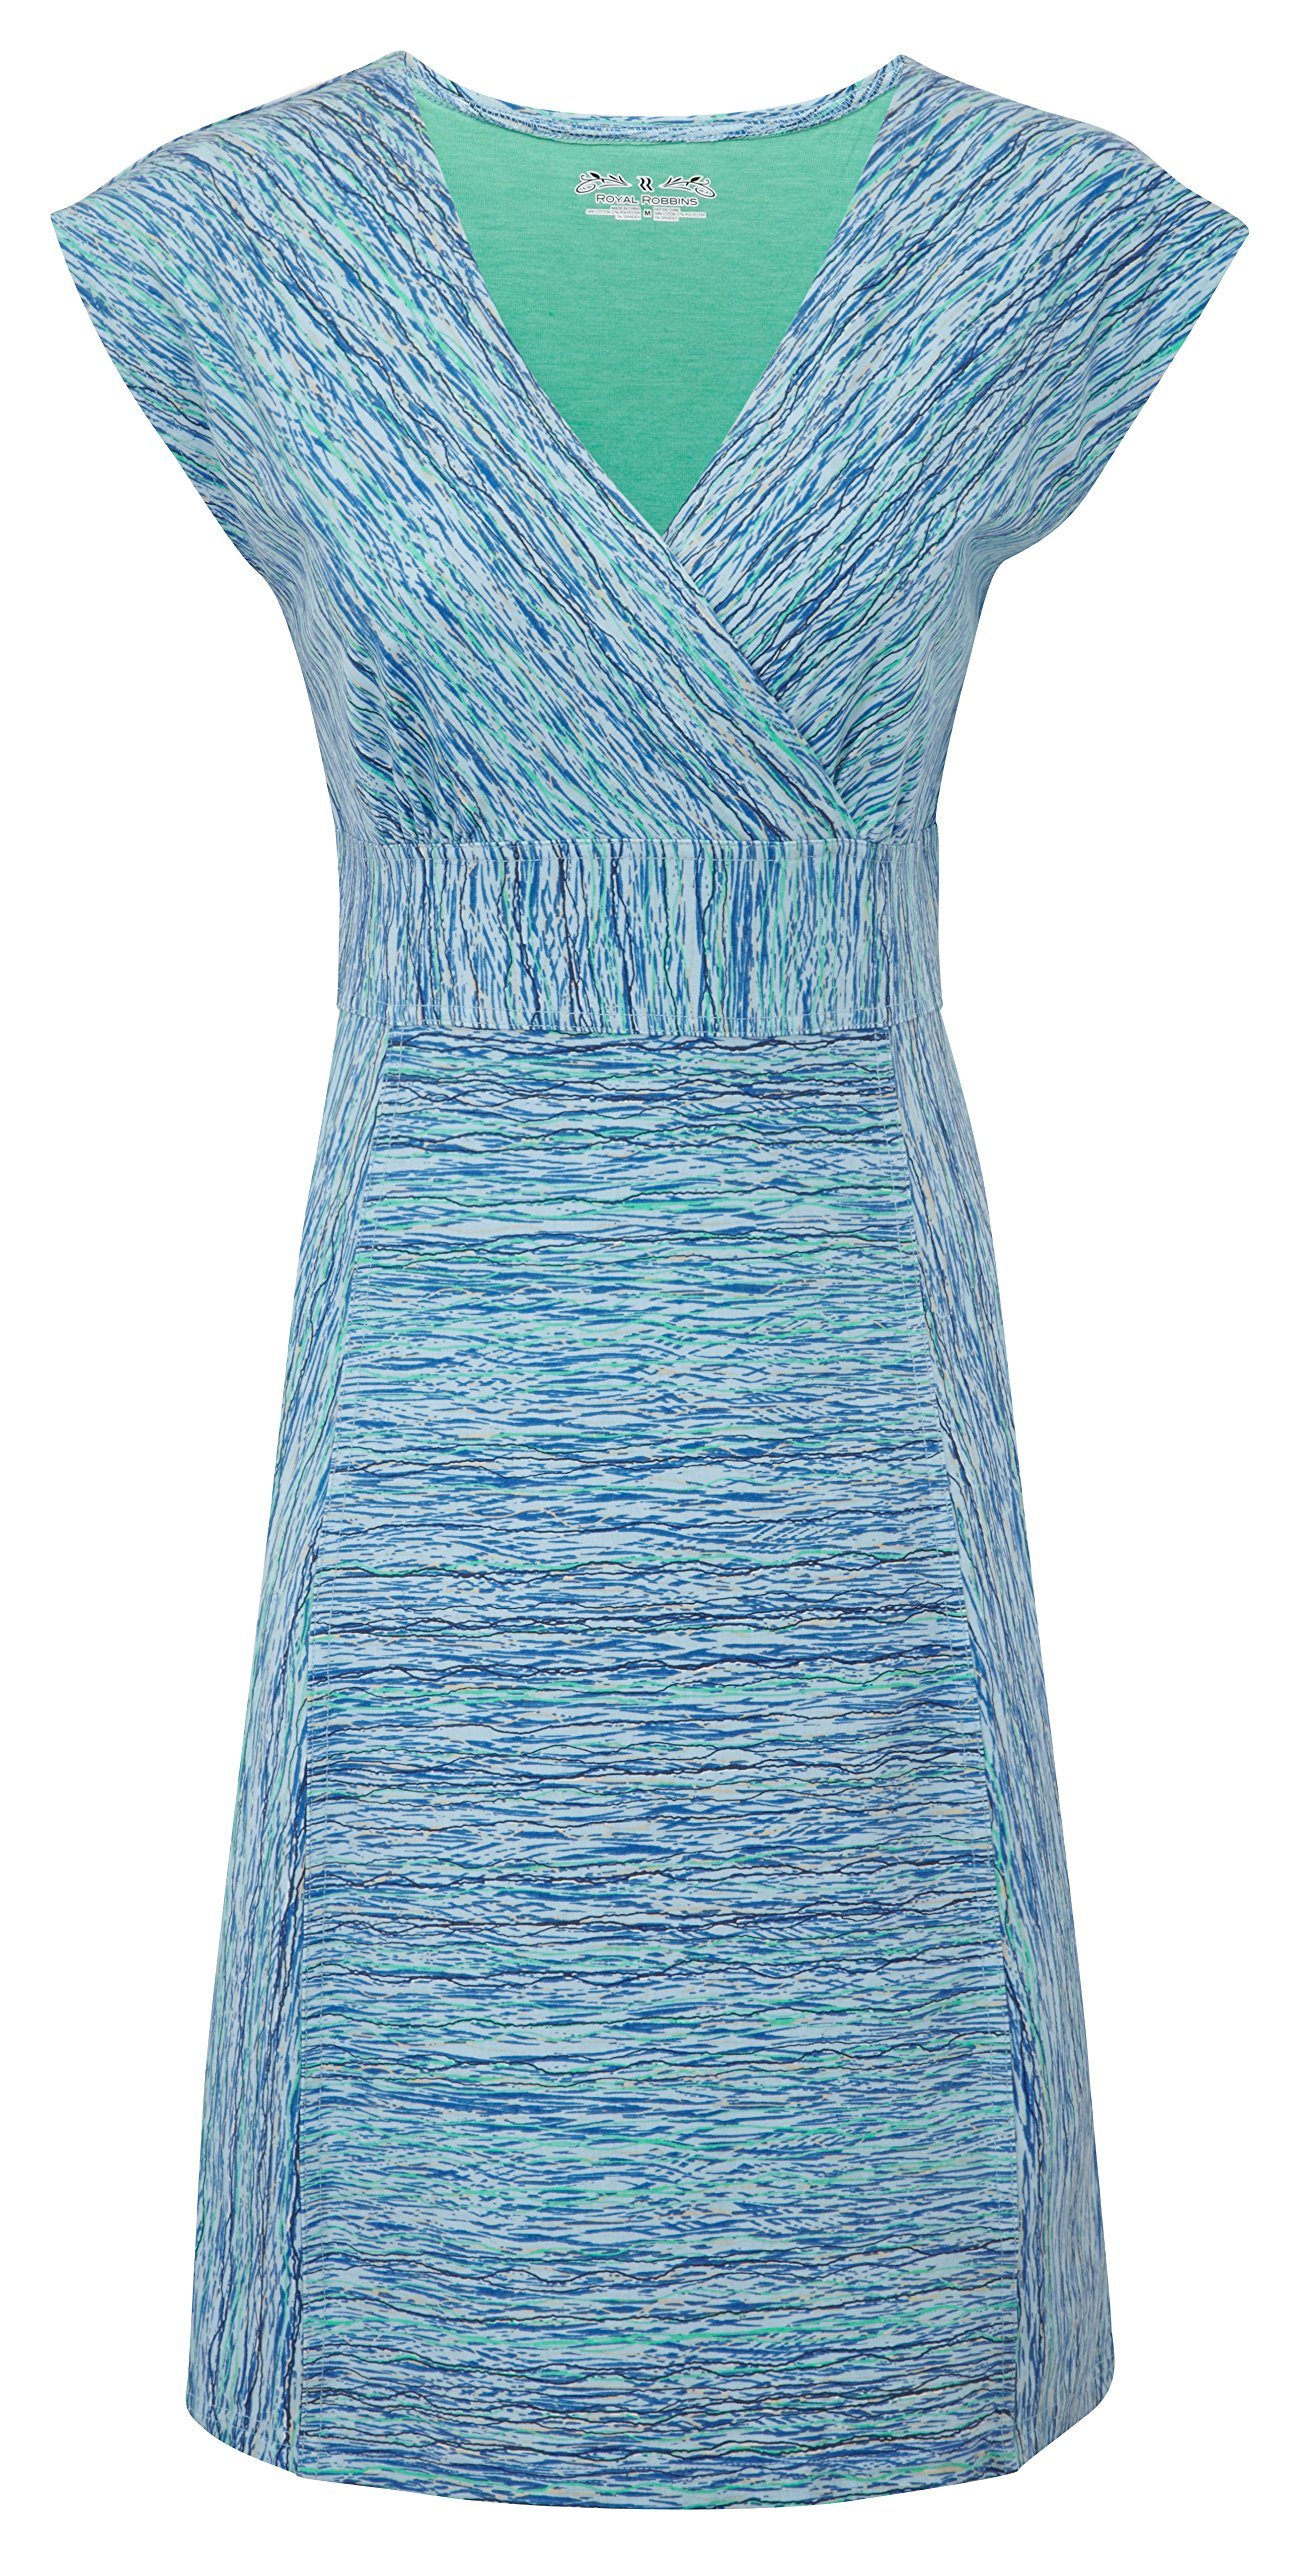 Royal Robbins Women's Essential Rio Dress Light Lapis Dress XS